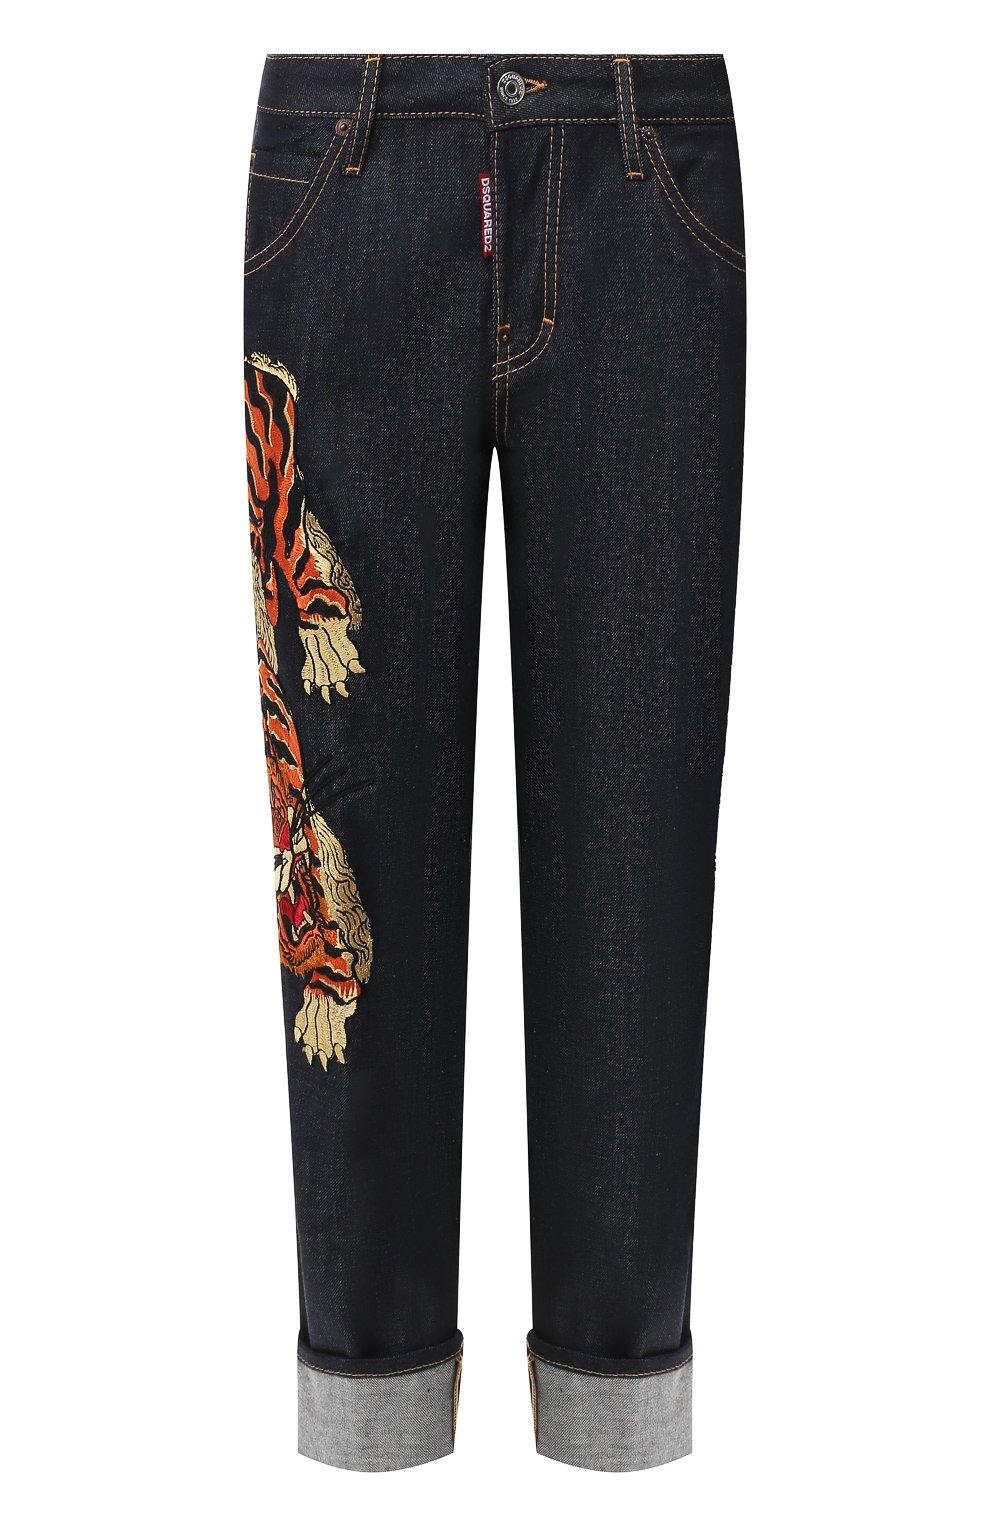 Женские джинсы DSQUARED2 синего цвета, арт. S72LB0307/S30309 | Фото 1